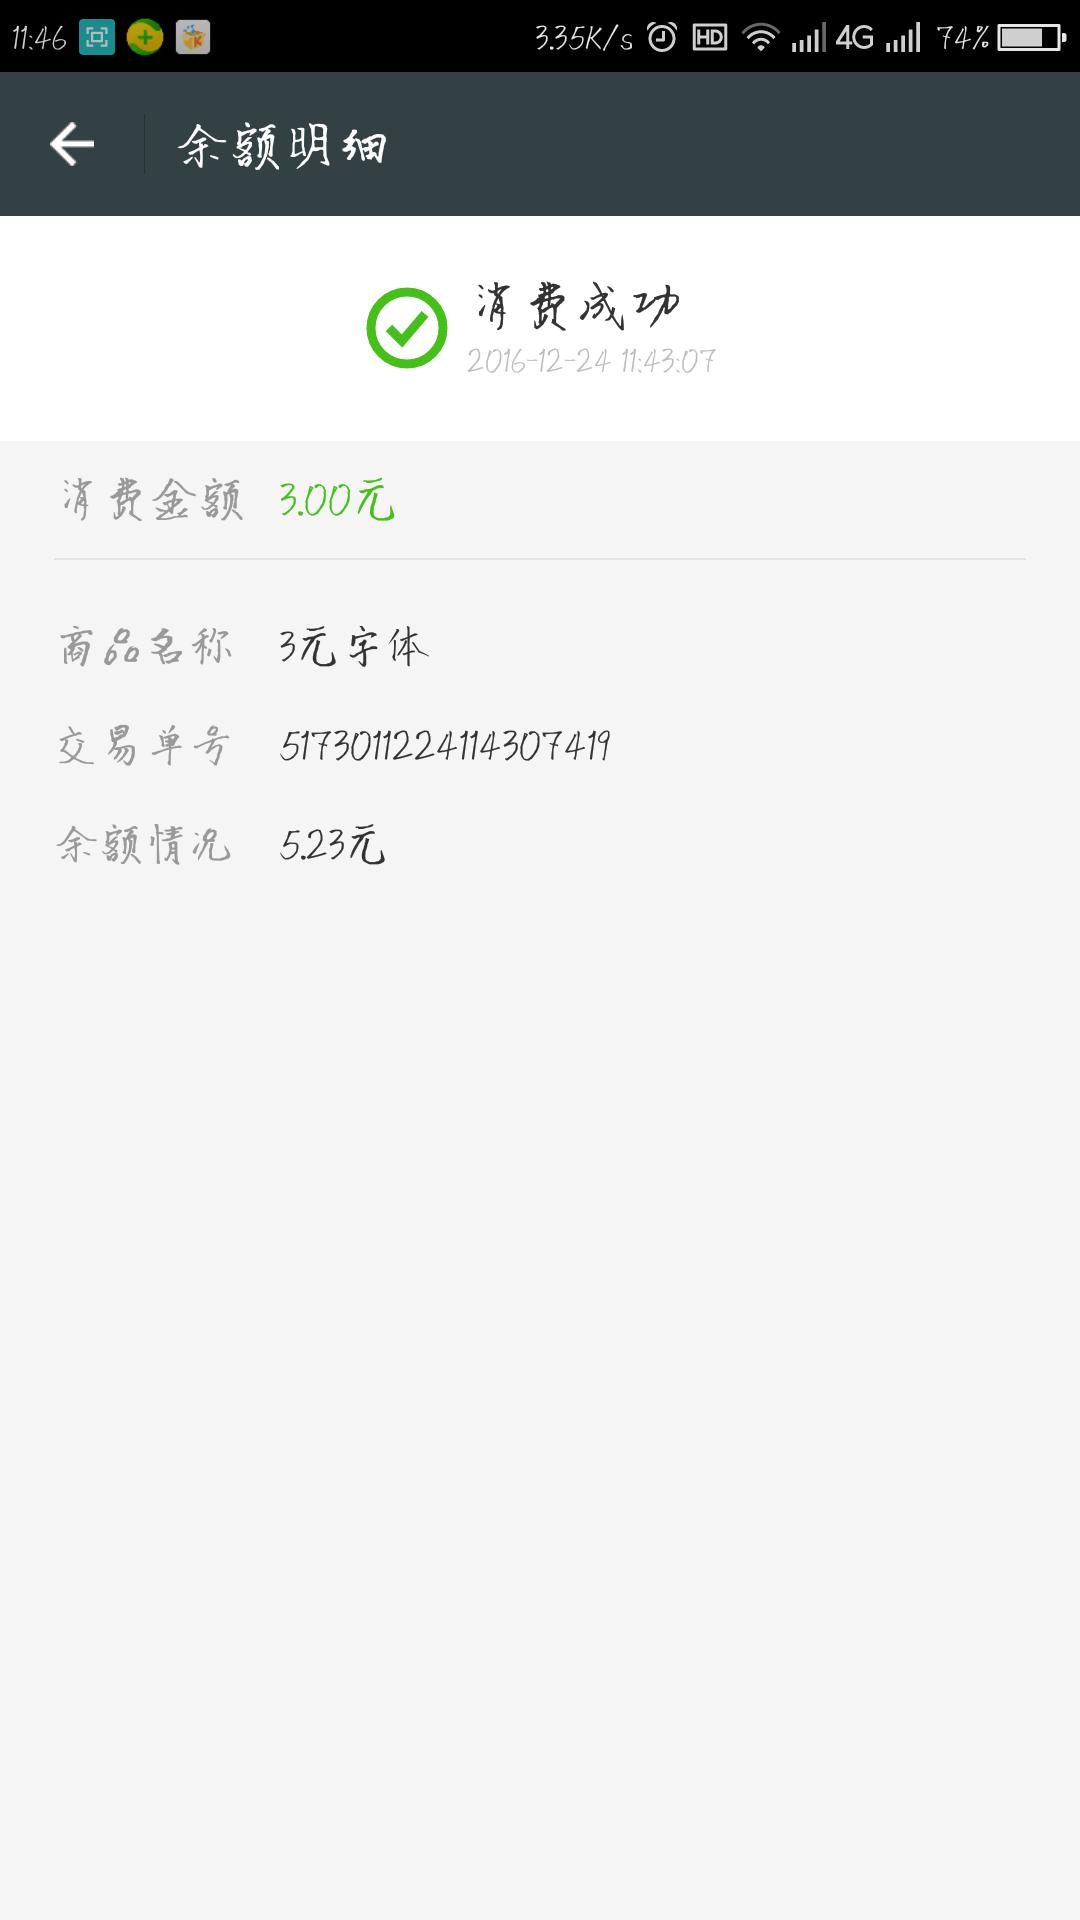 Screenshot_2016-12-24-11-46-04.png